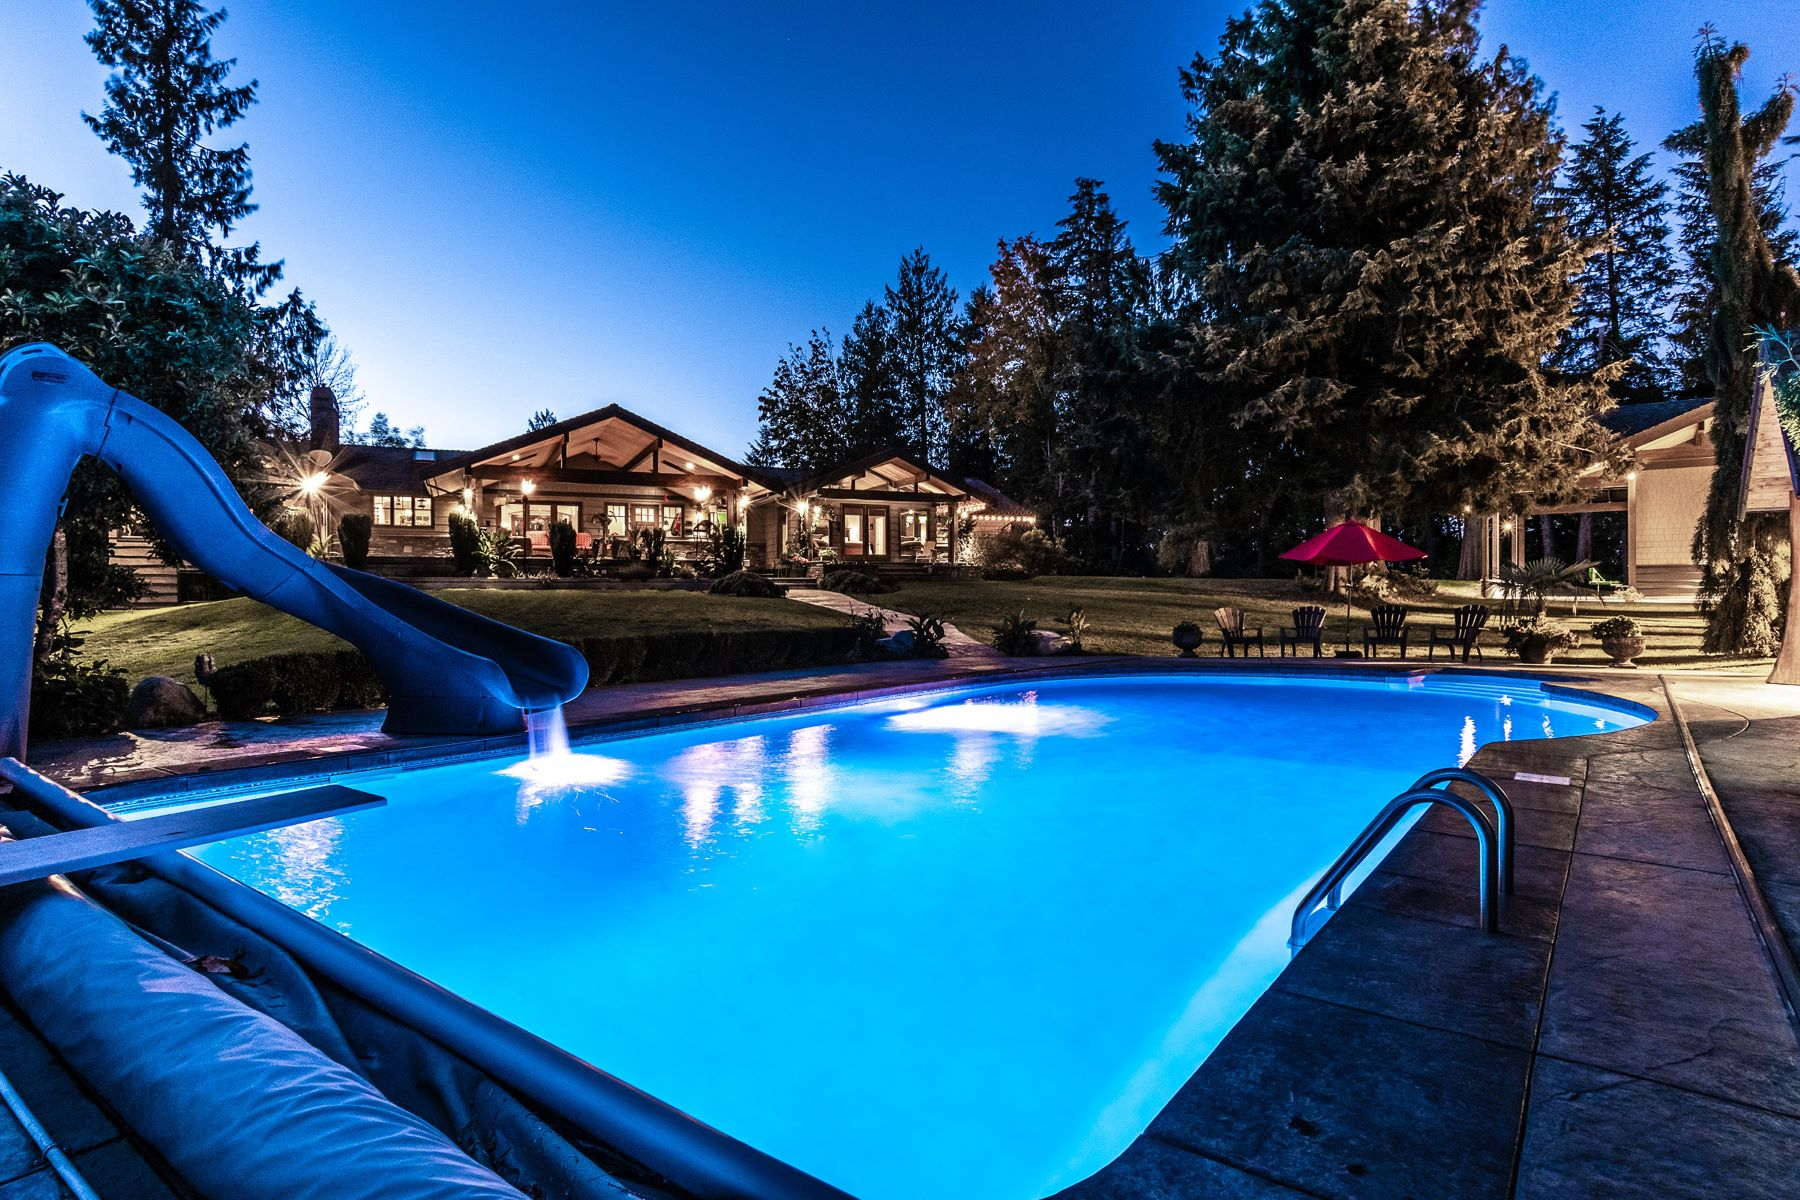 Land for Sale at Ryder Lake Glacier Peak Chalet 47140 Thornton Rd Chilliwack, British Columbia V2R 4S9 Canada